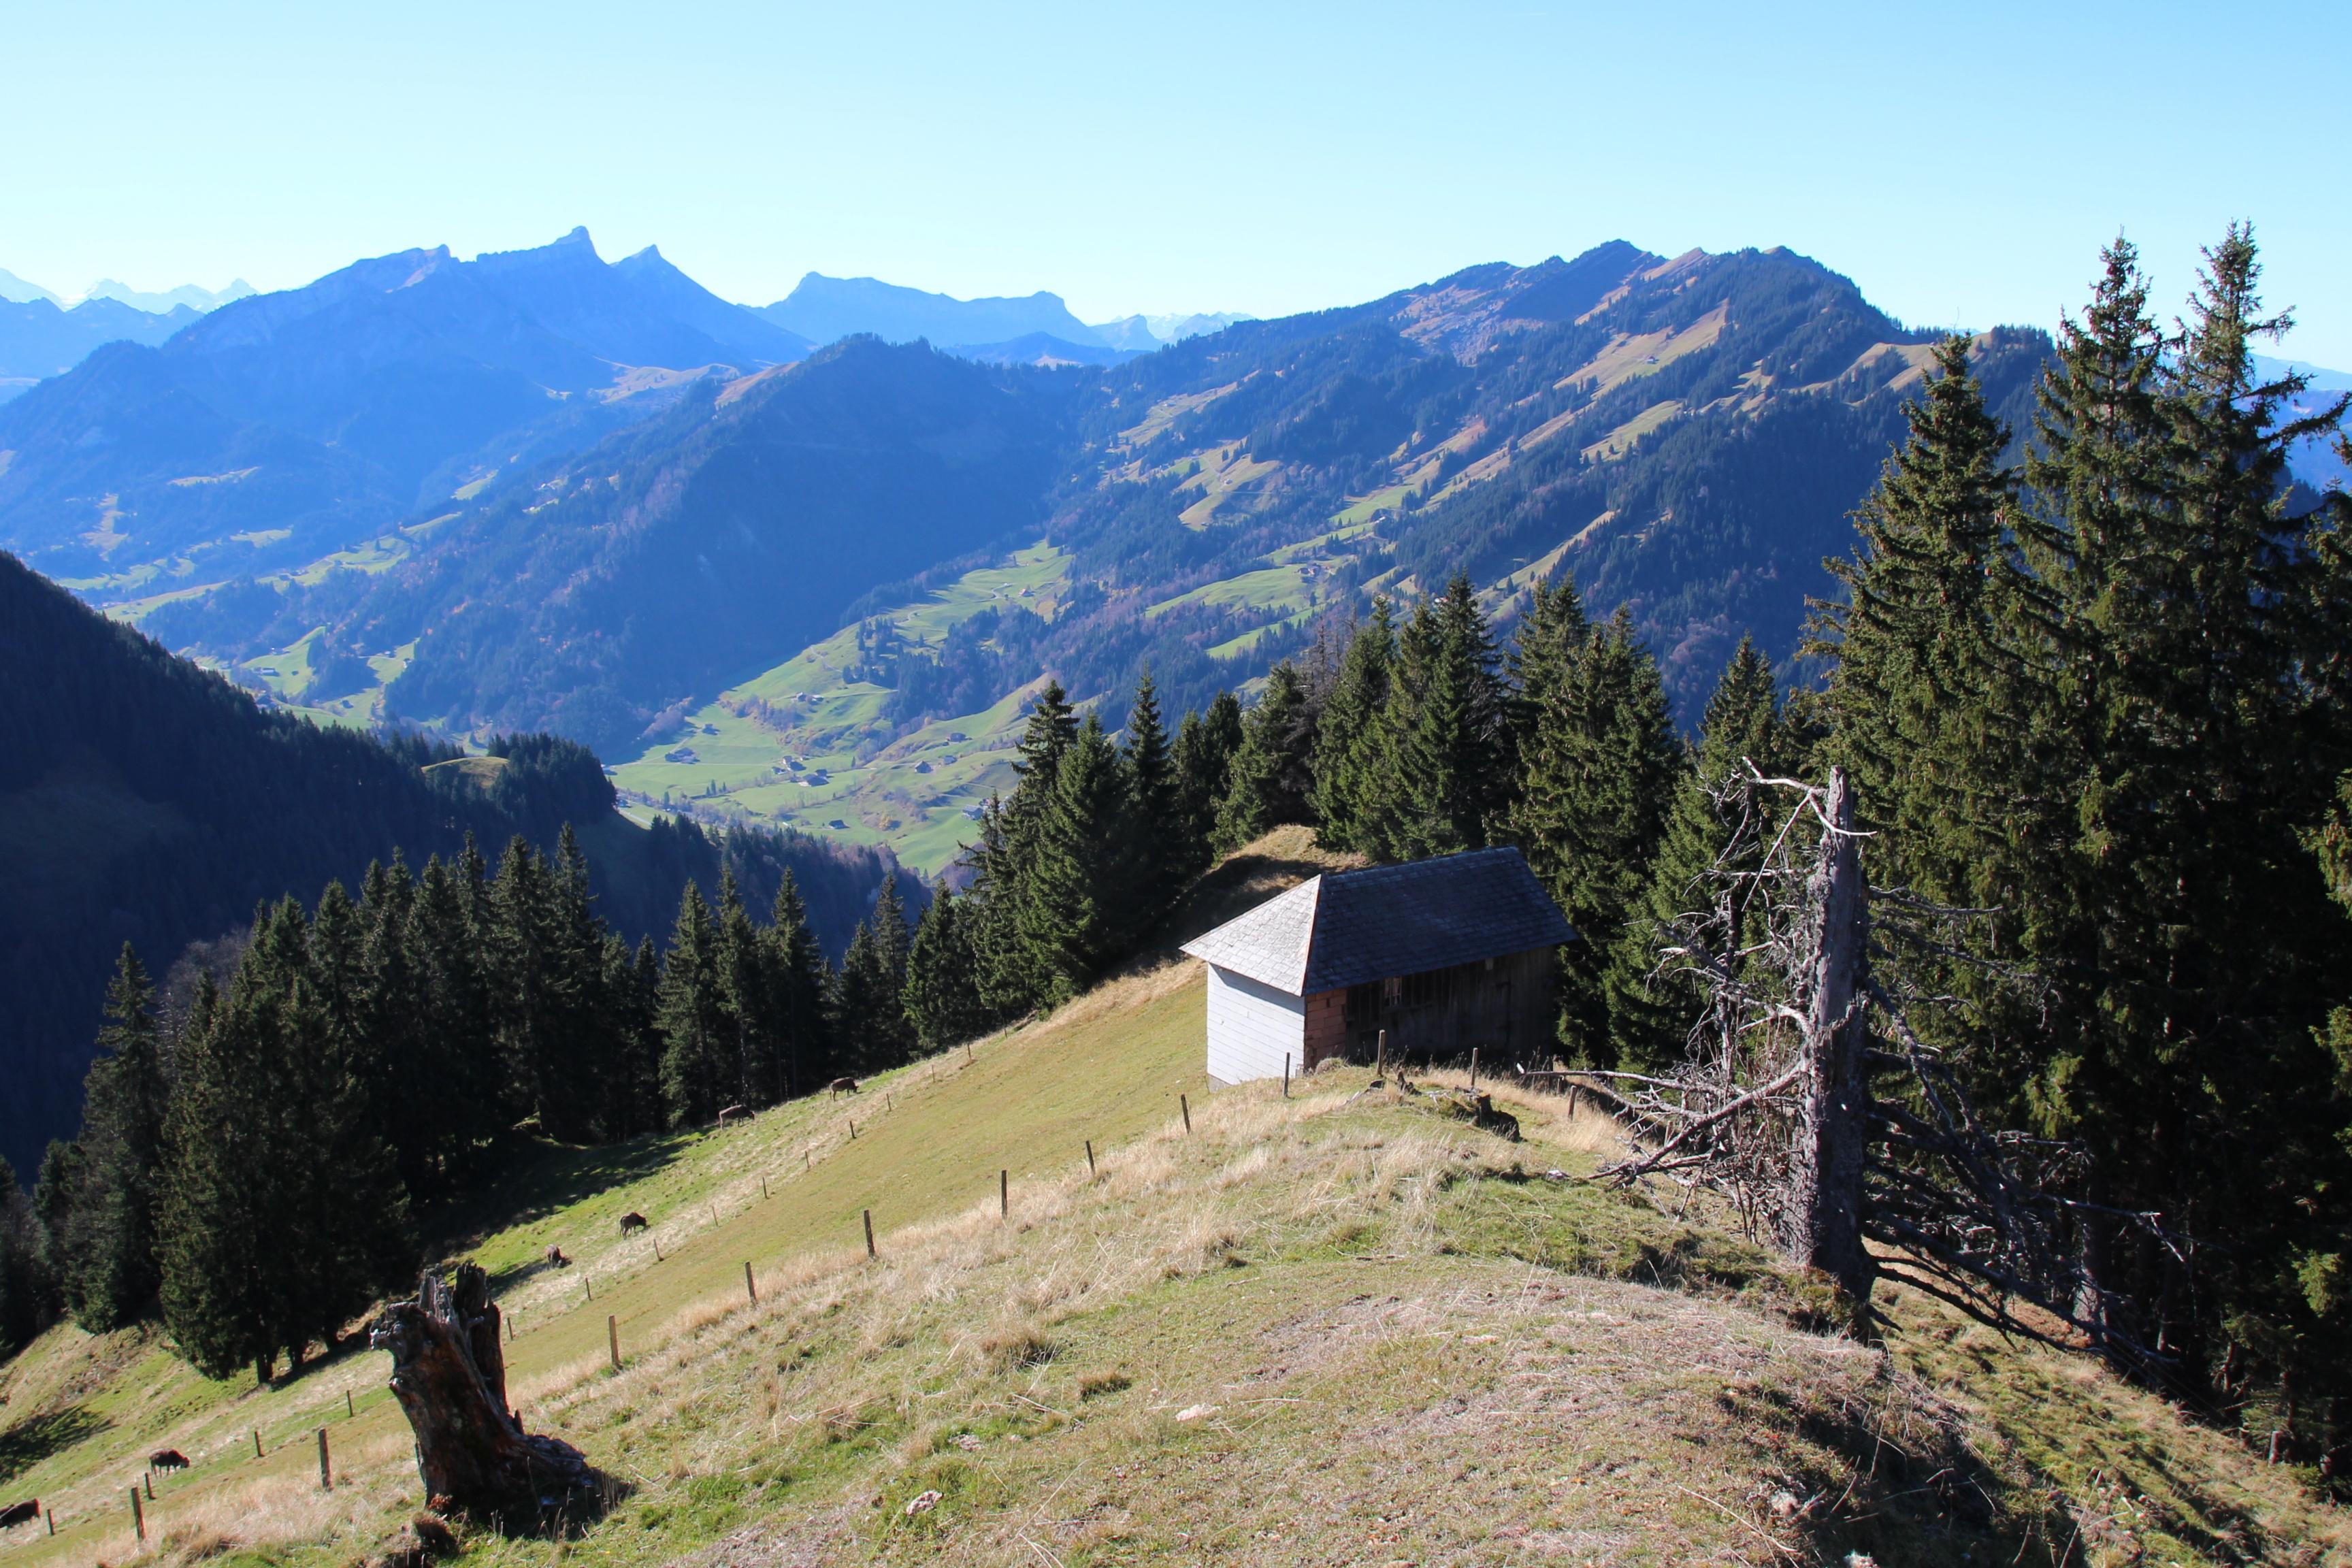 Seilbahn Chlusen-Farneren, Bergstation Schüpfheim